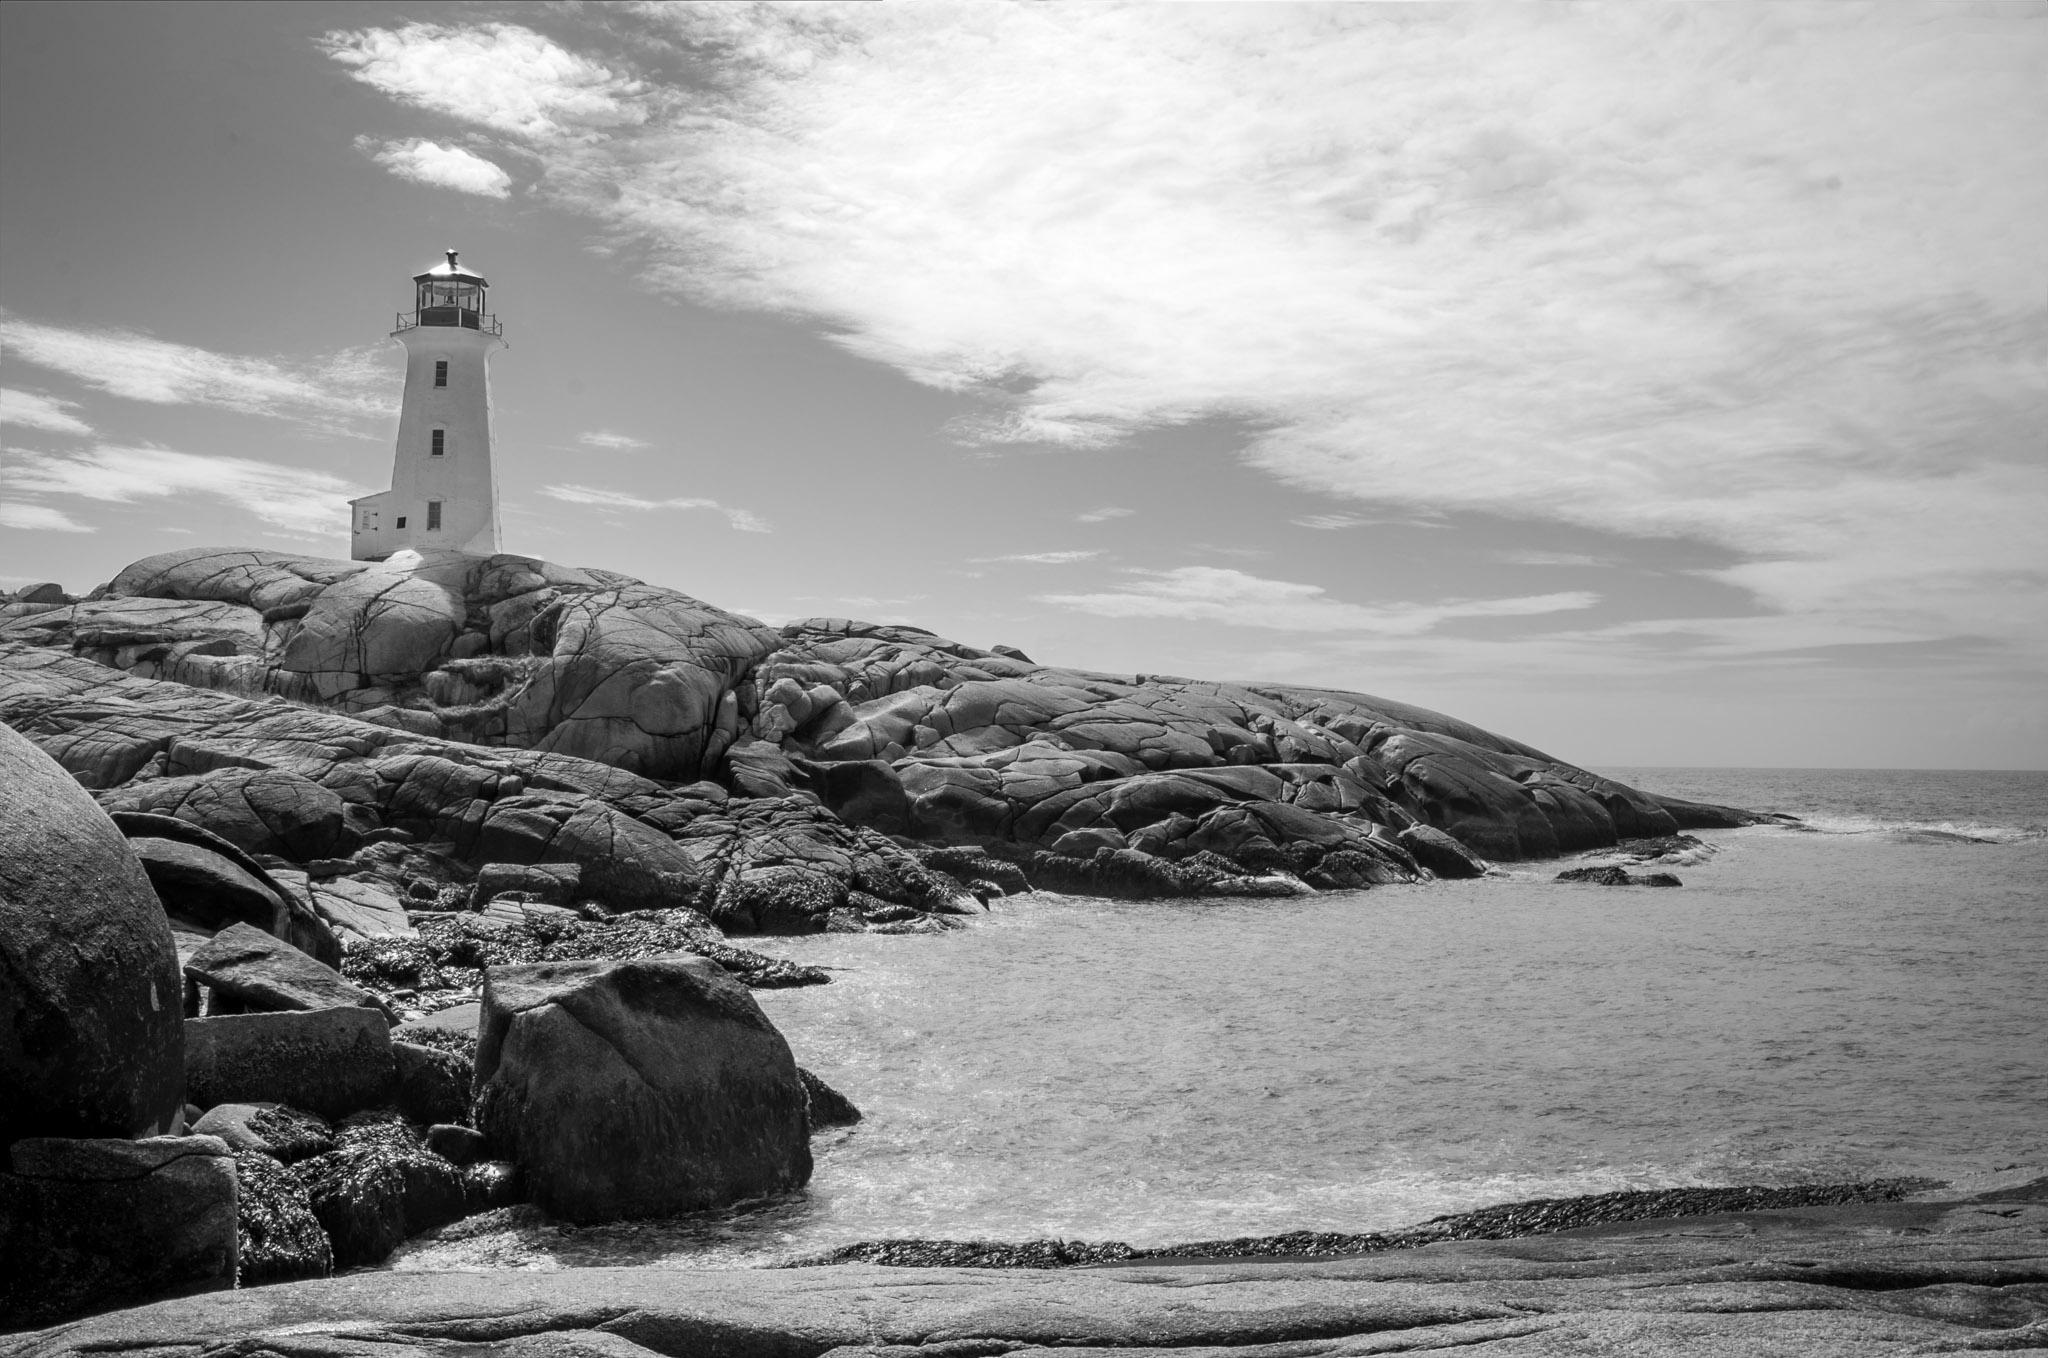 Guardian, Peggy's Cove, Nova Scotia, Canada